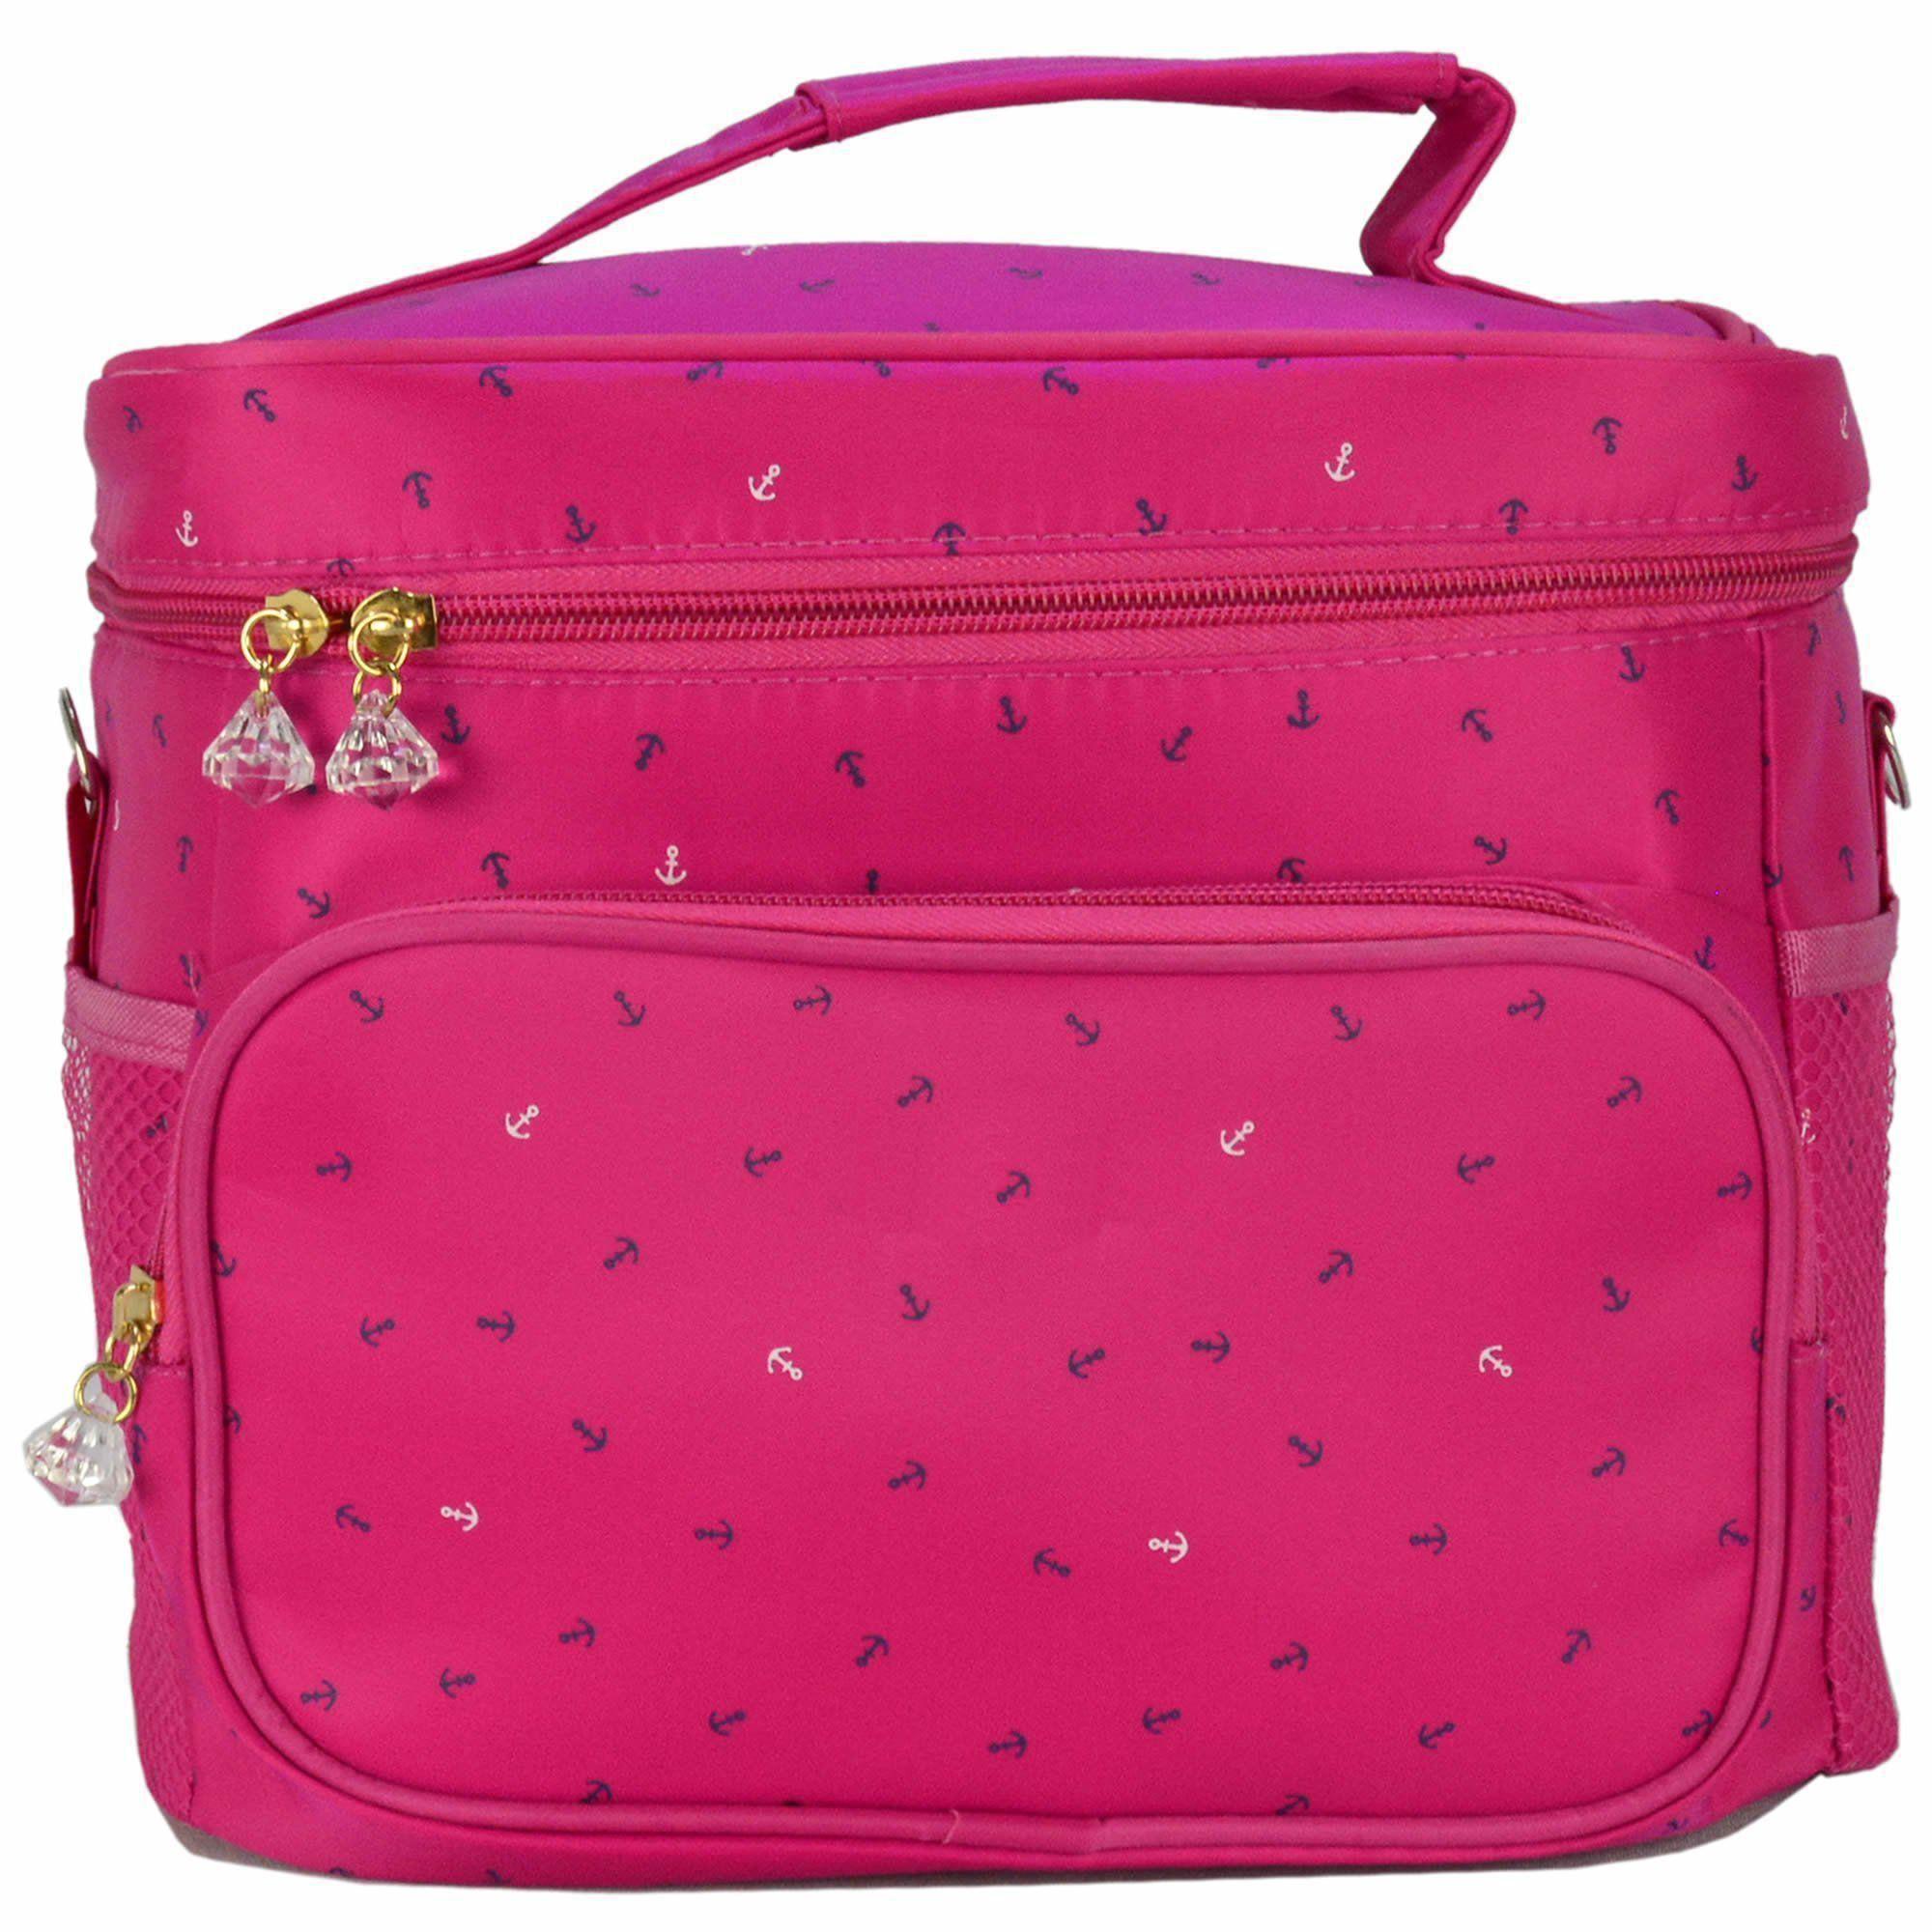 Nécessaire Feminina Bolsa Térmica Fitness Pink CBRN08056